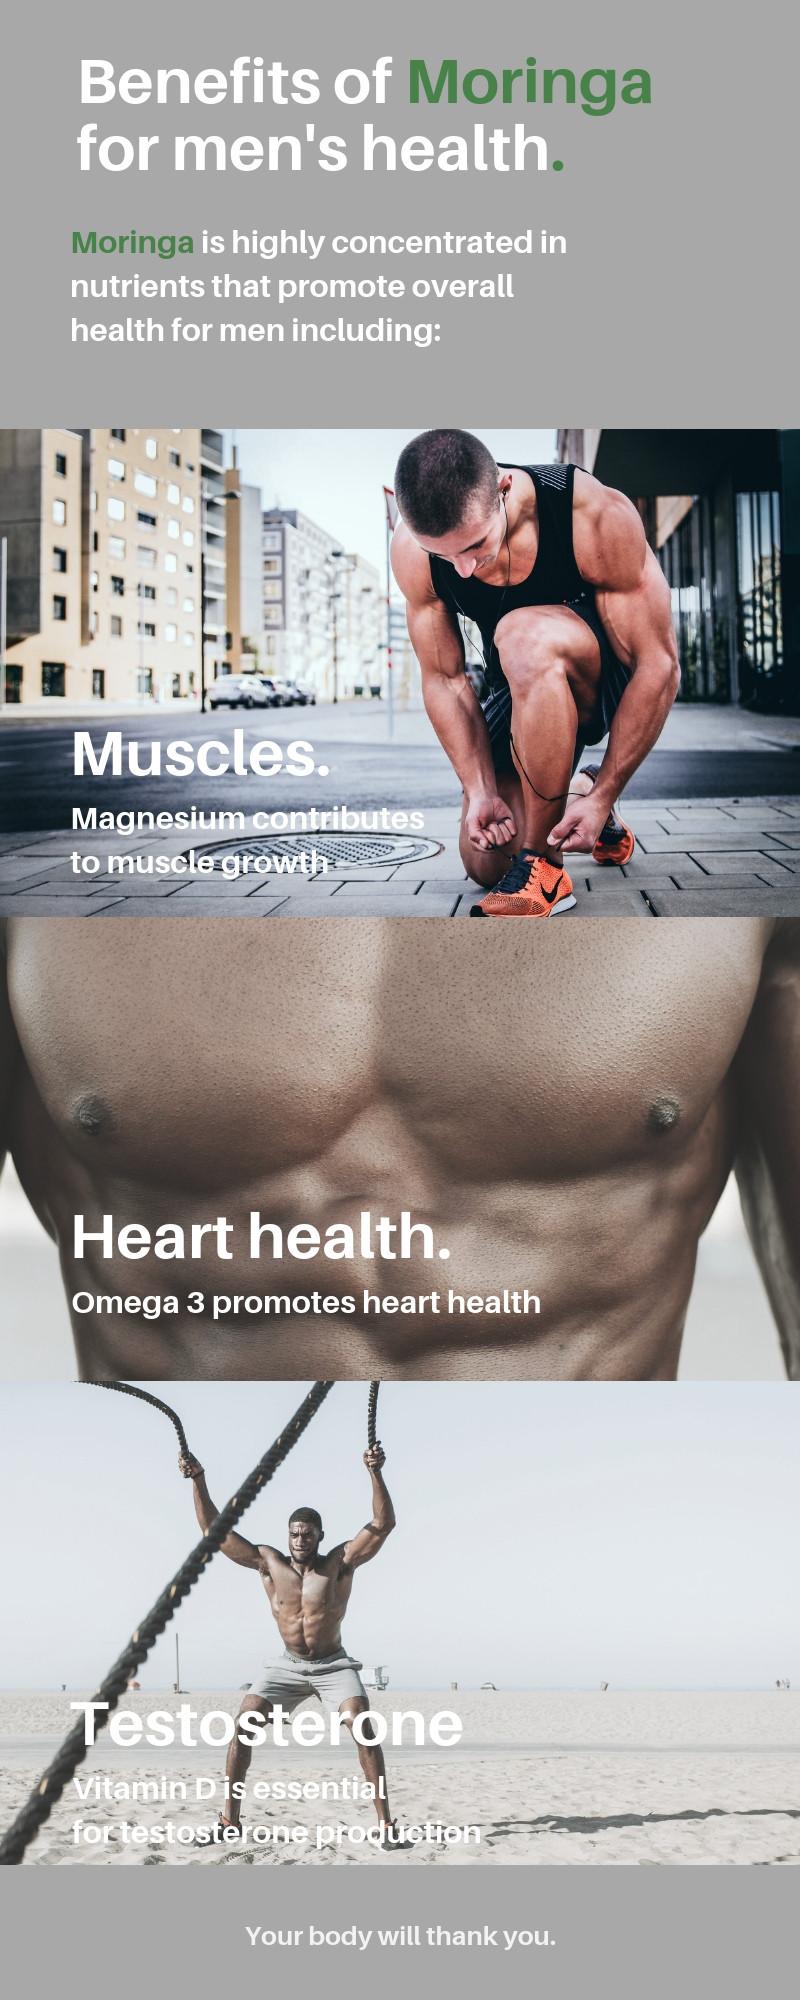 Benefits of Moringa for men's health